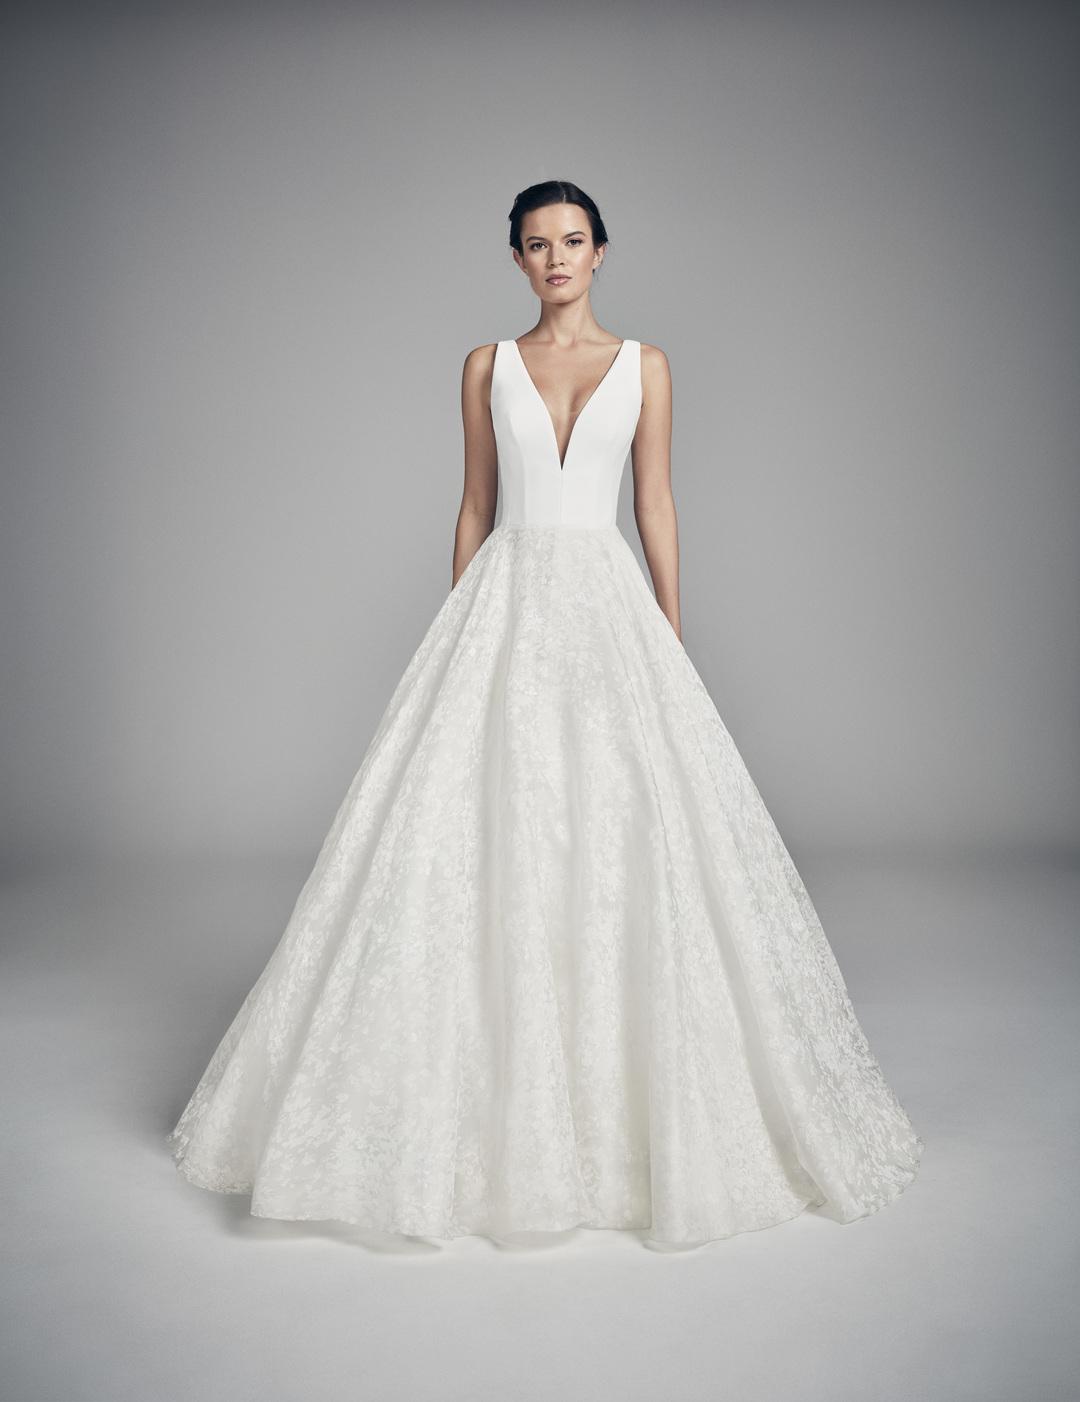 swan dress photo